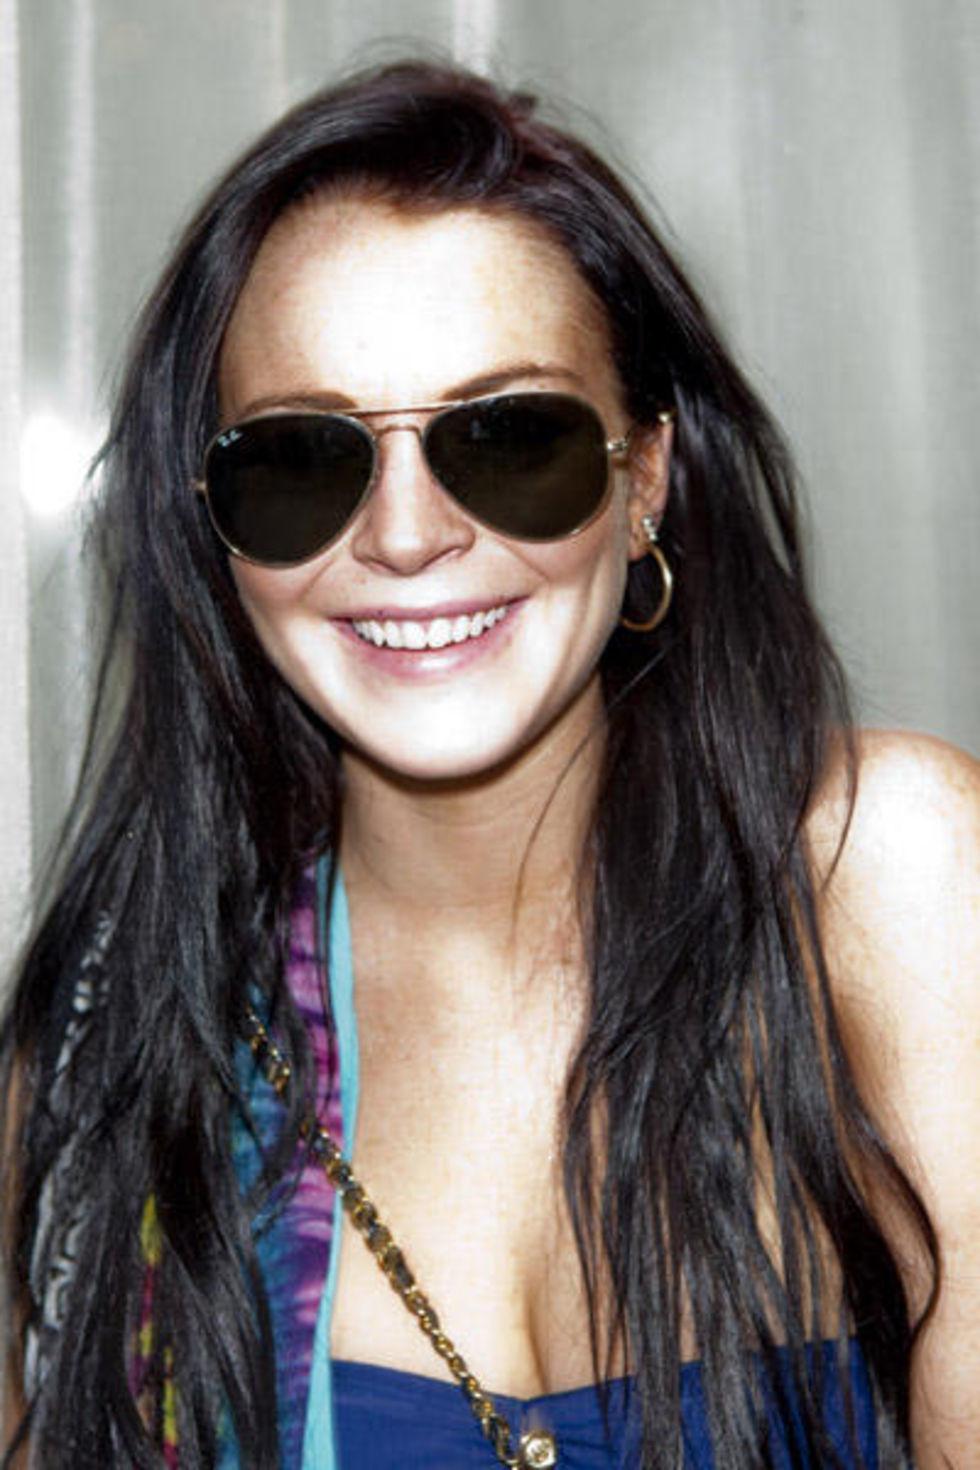 Lindsay Lohan 2010 : lindsay-lohan-bikini-top-at-music-loves-fashion-and-house-of-hype-03